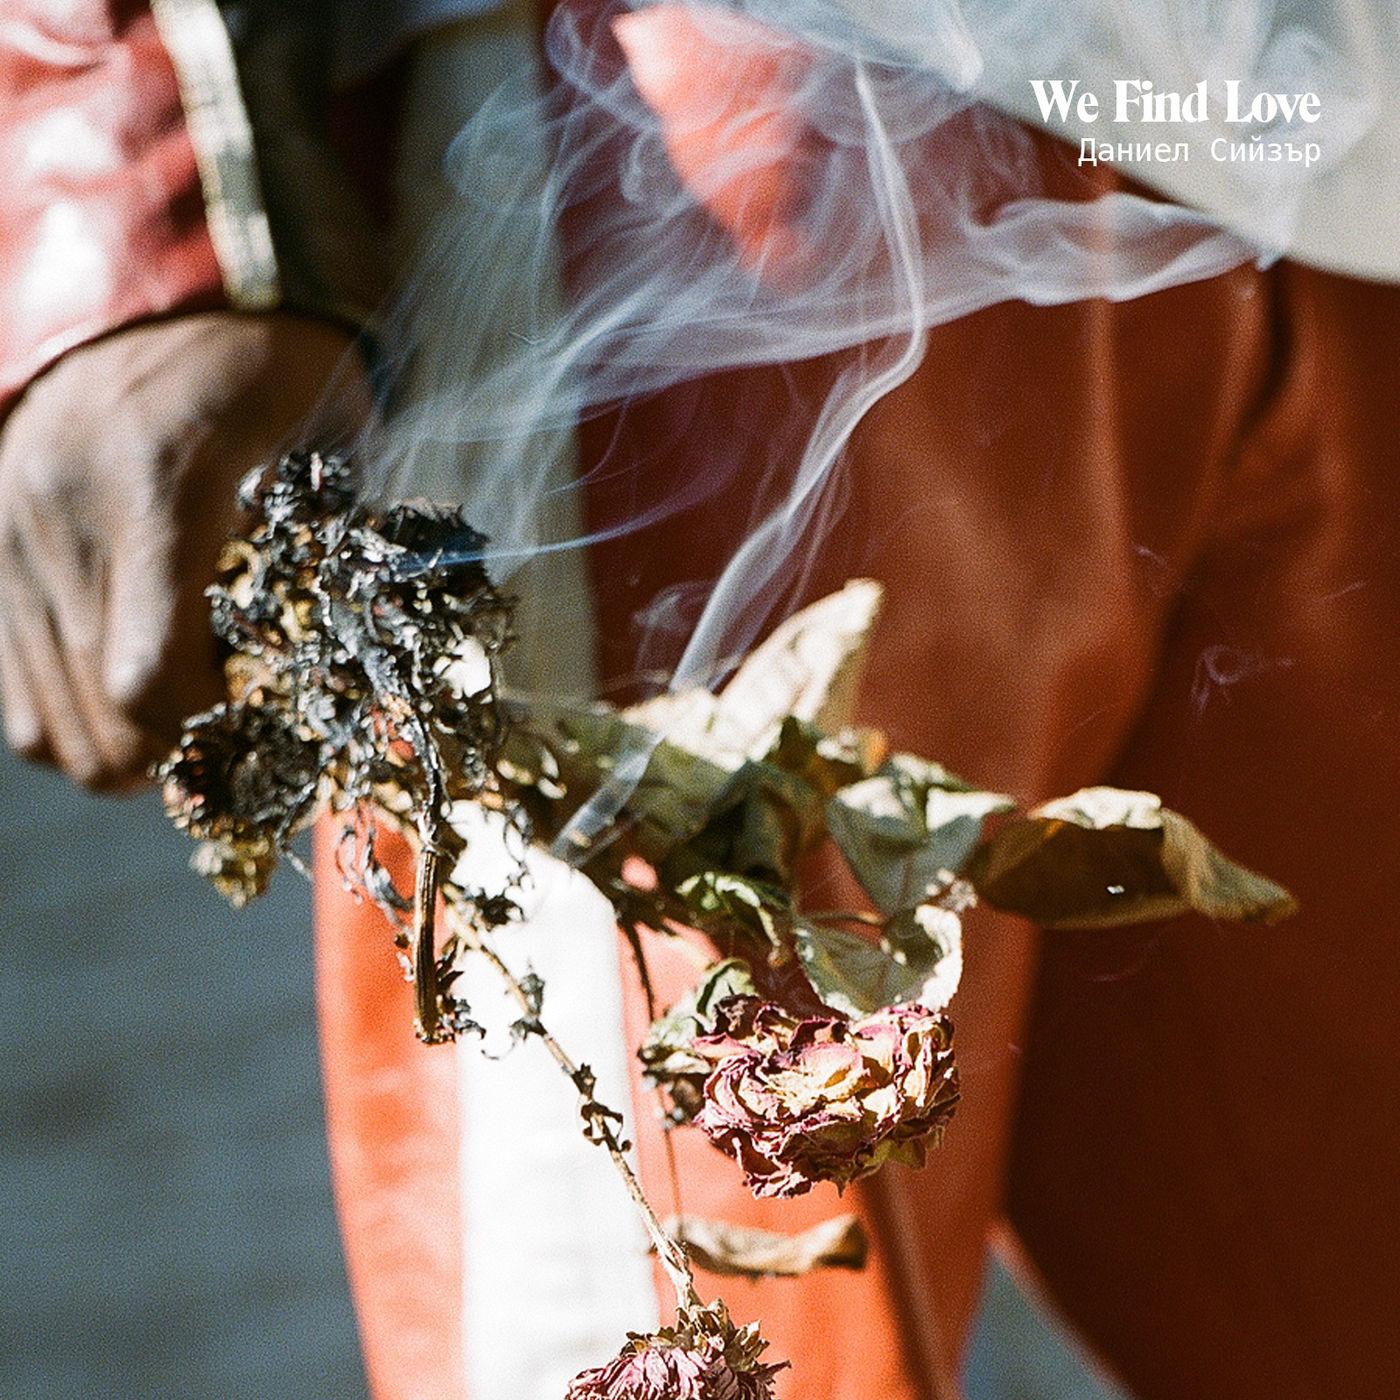 Daniel Caesar - We Find Love - Single Cover